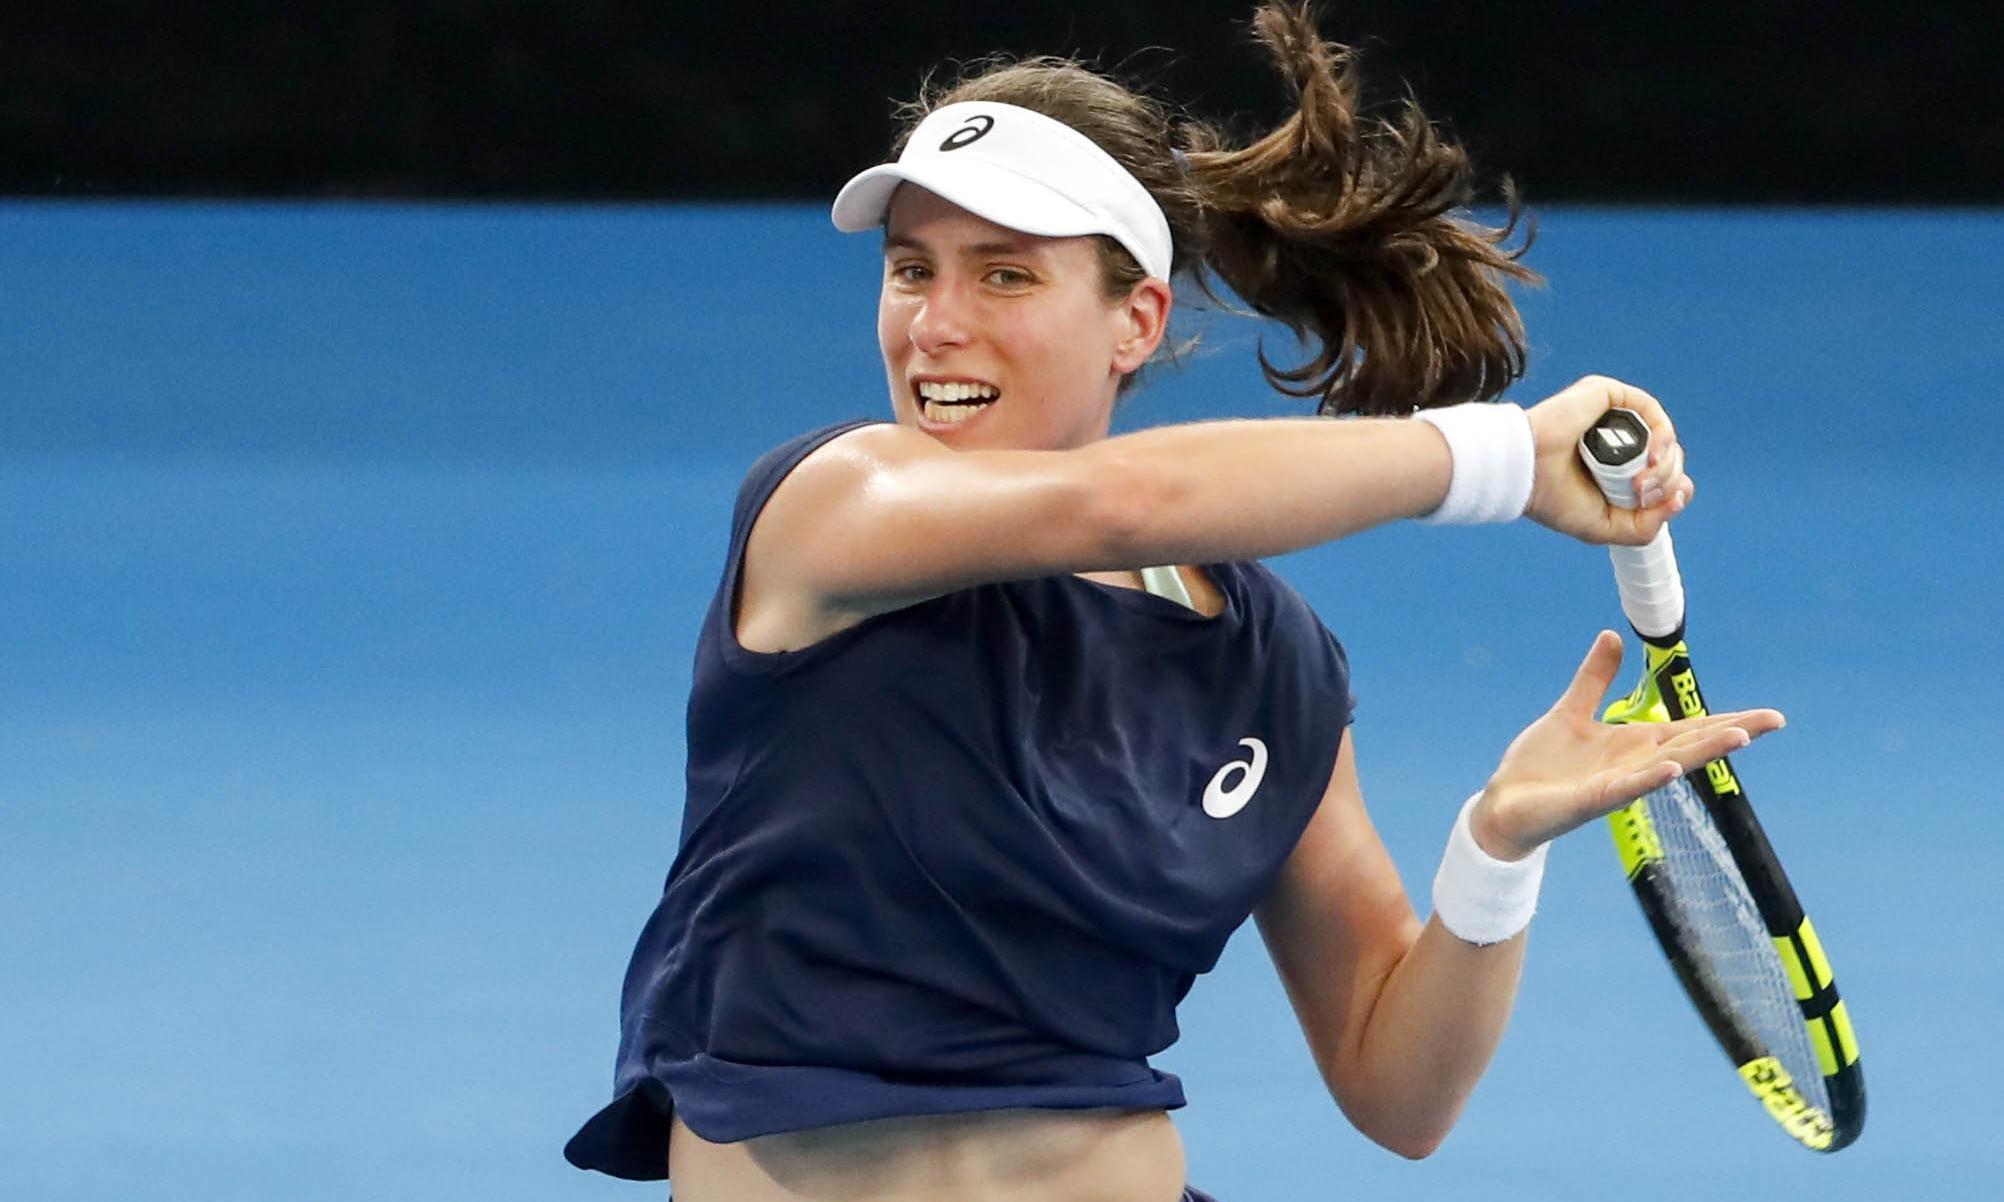 Johanna Konta's Australian Open chances given unexpected boost